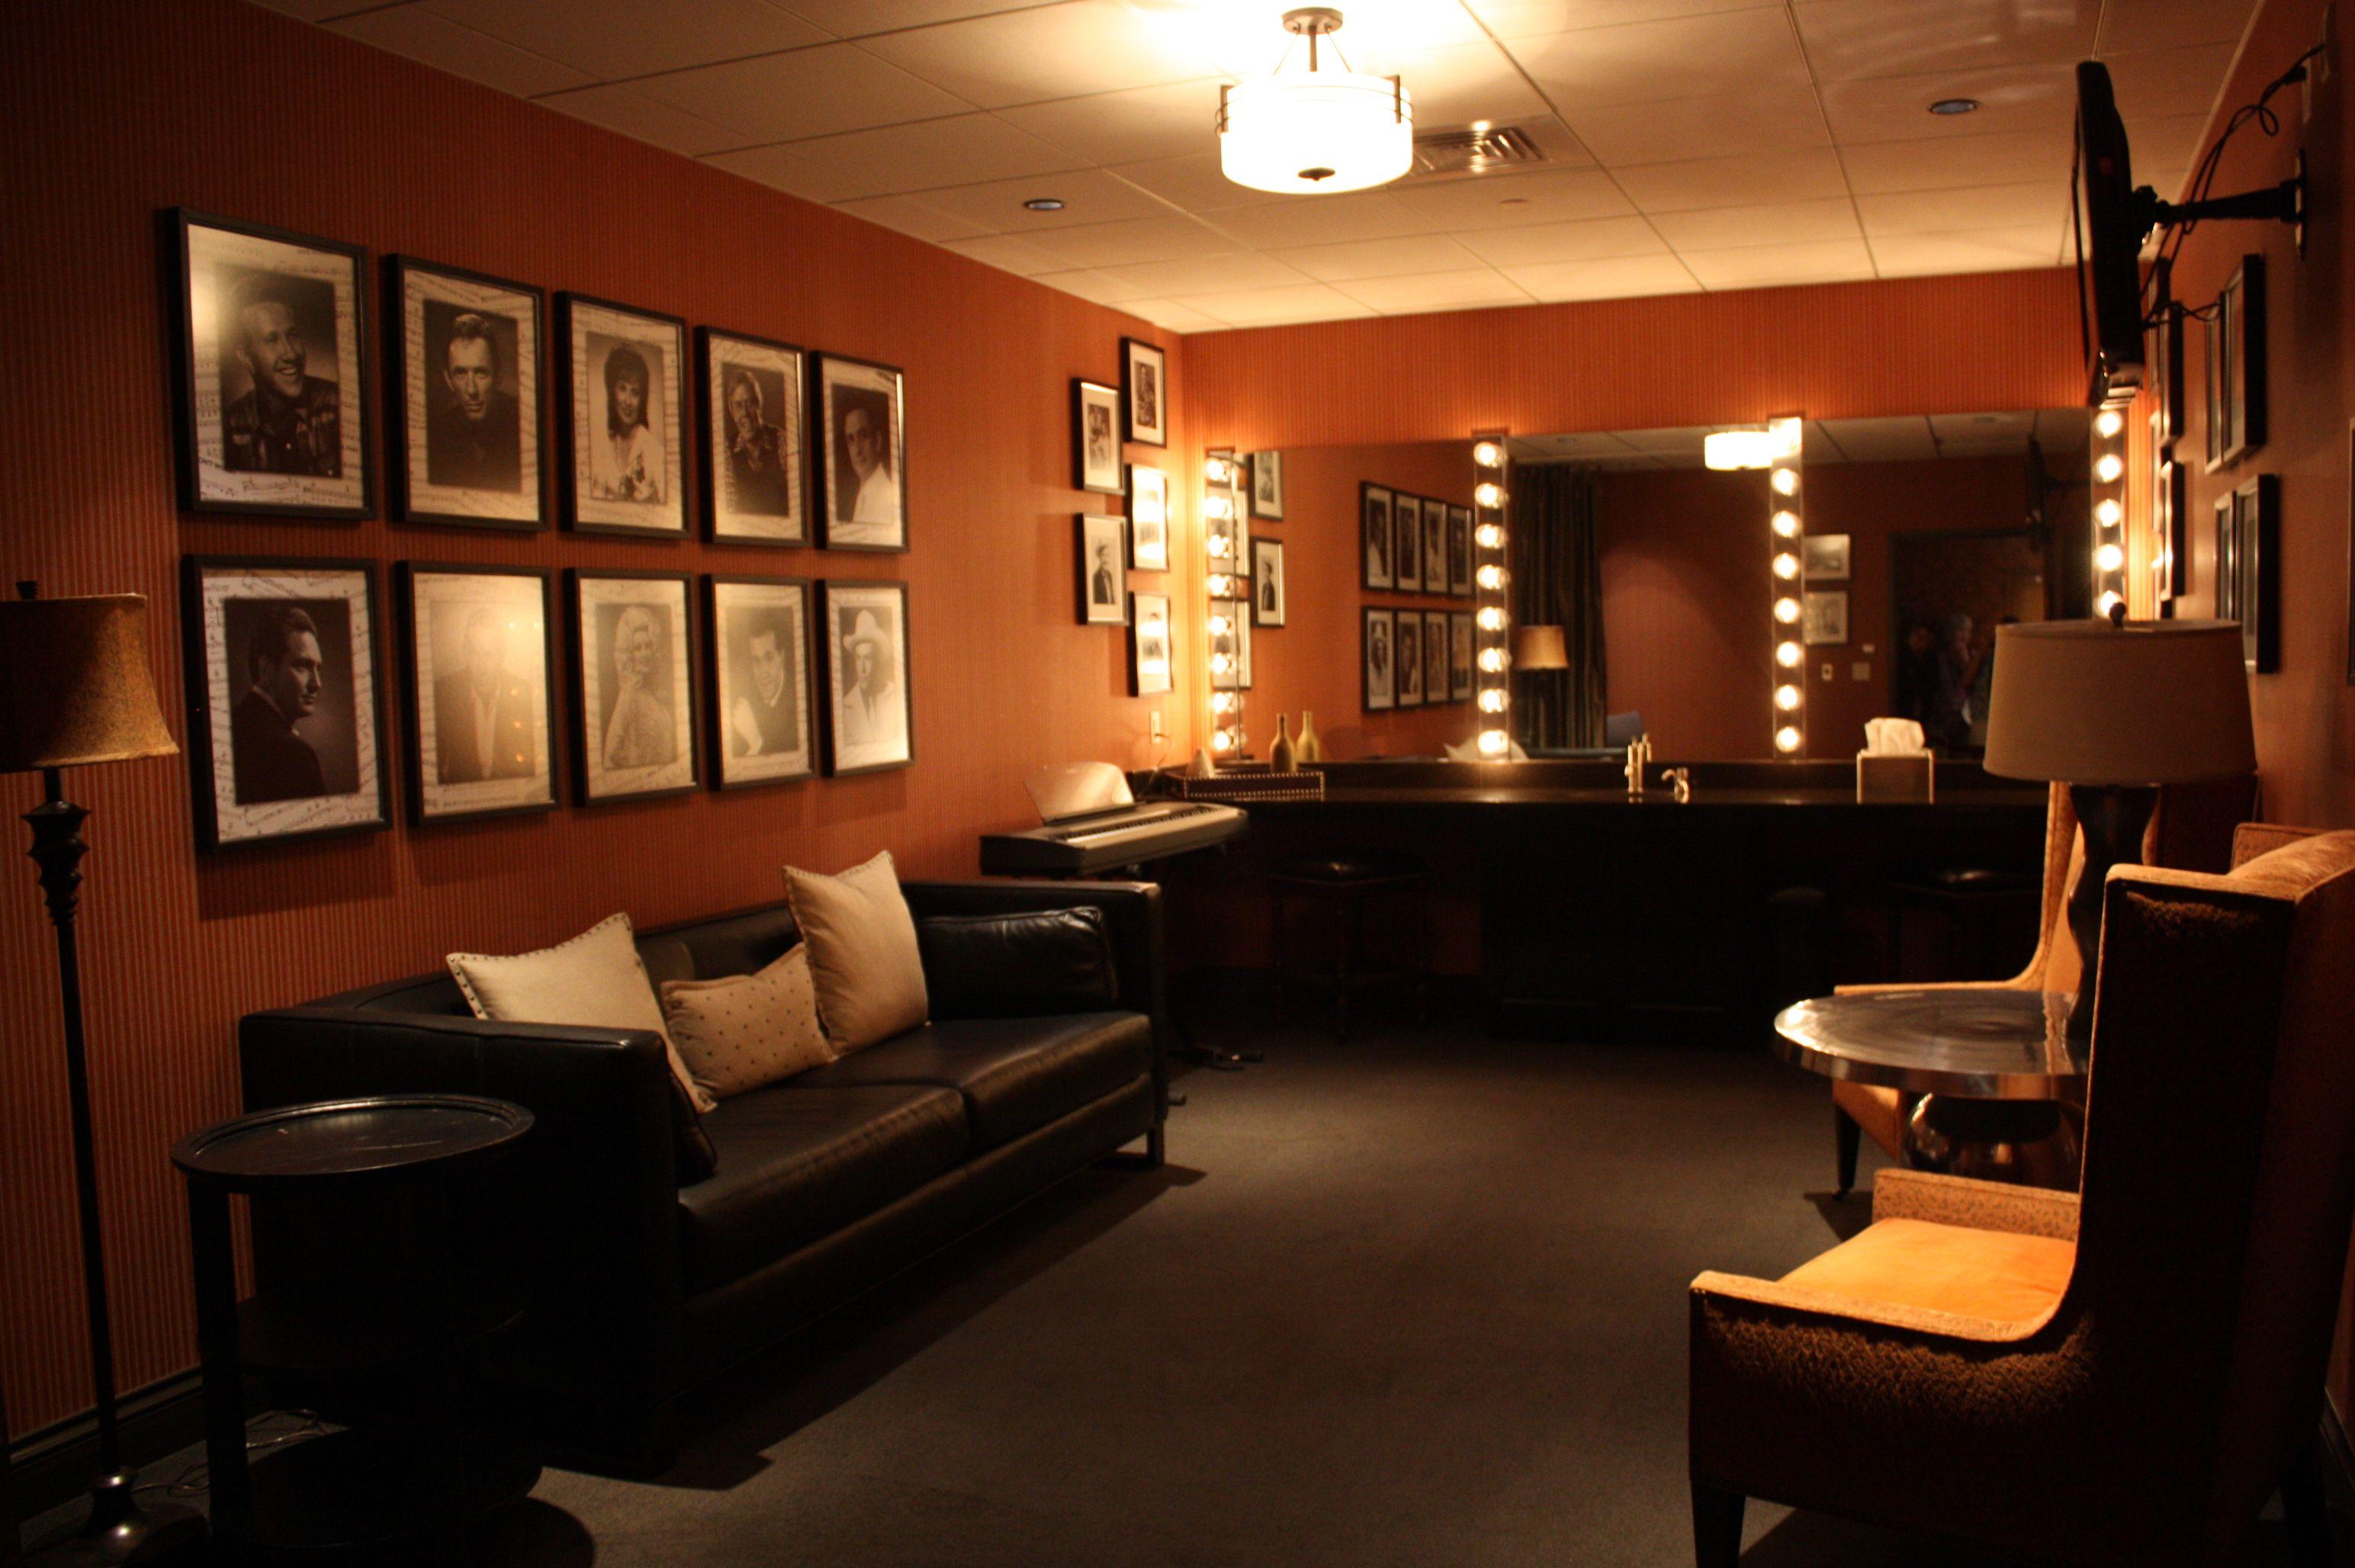 backstage dressing rooms - bing images | gcc green room